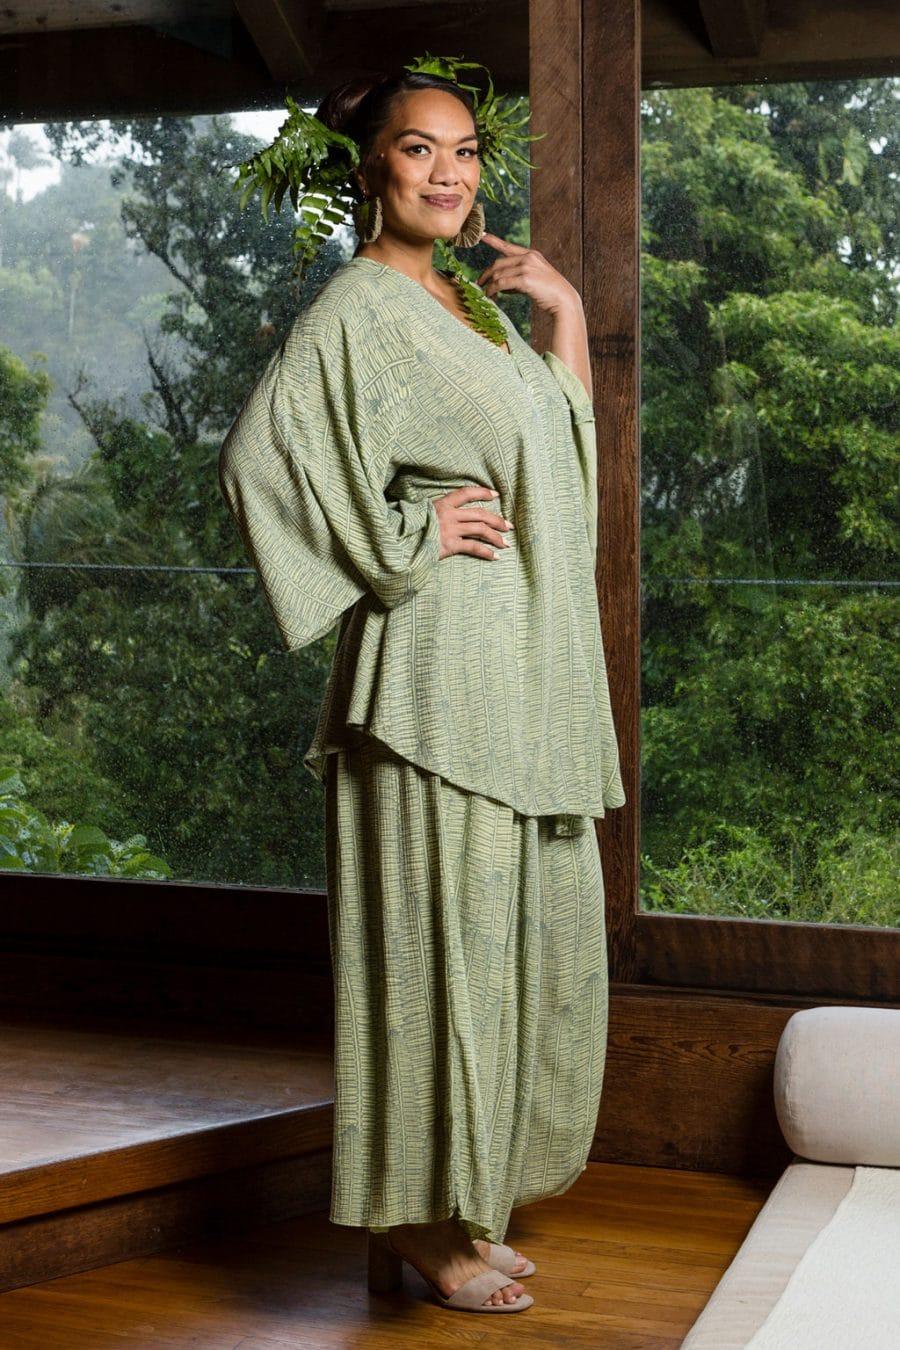 Model wearing Mailei Cover Up in Margarita Lily Pad Kupukupu pattern